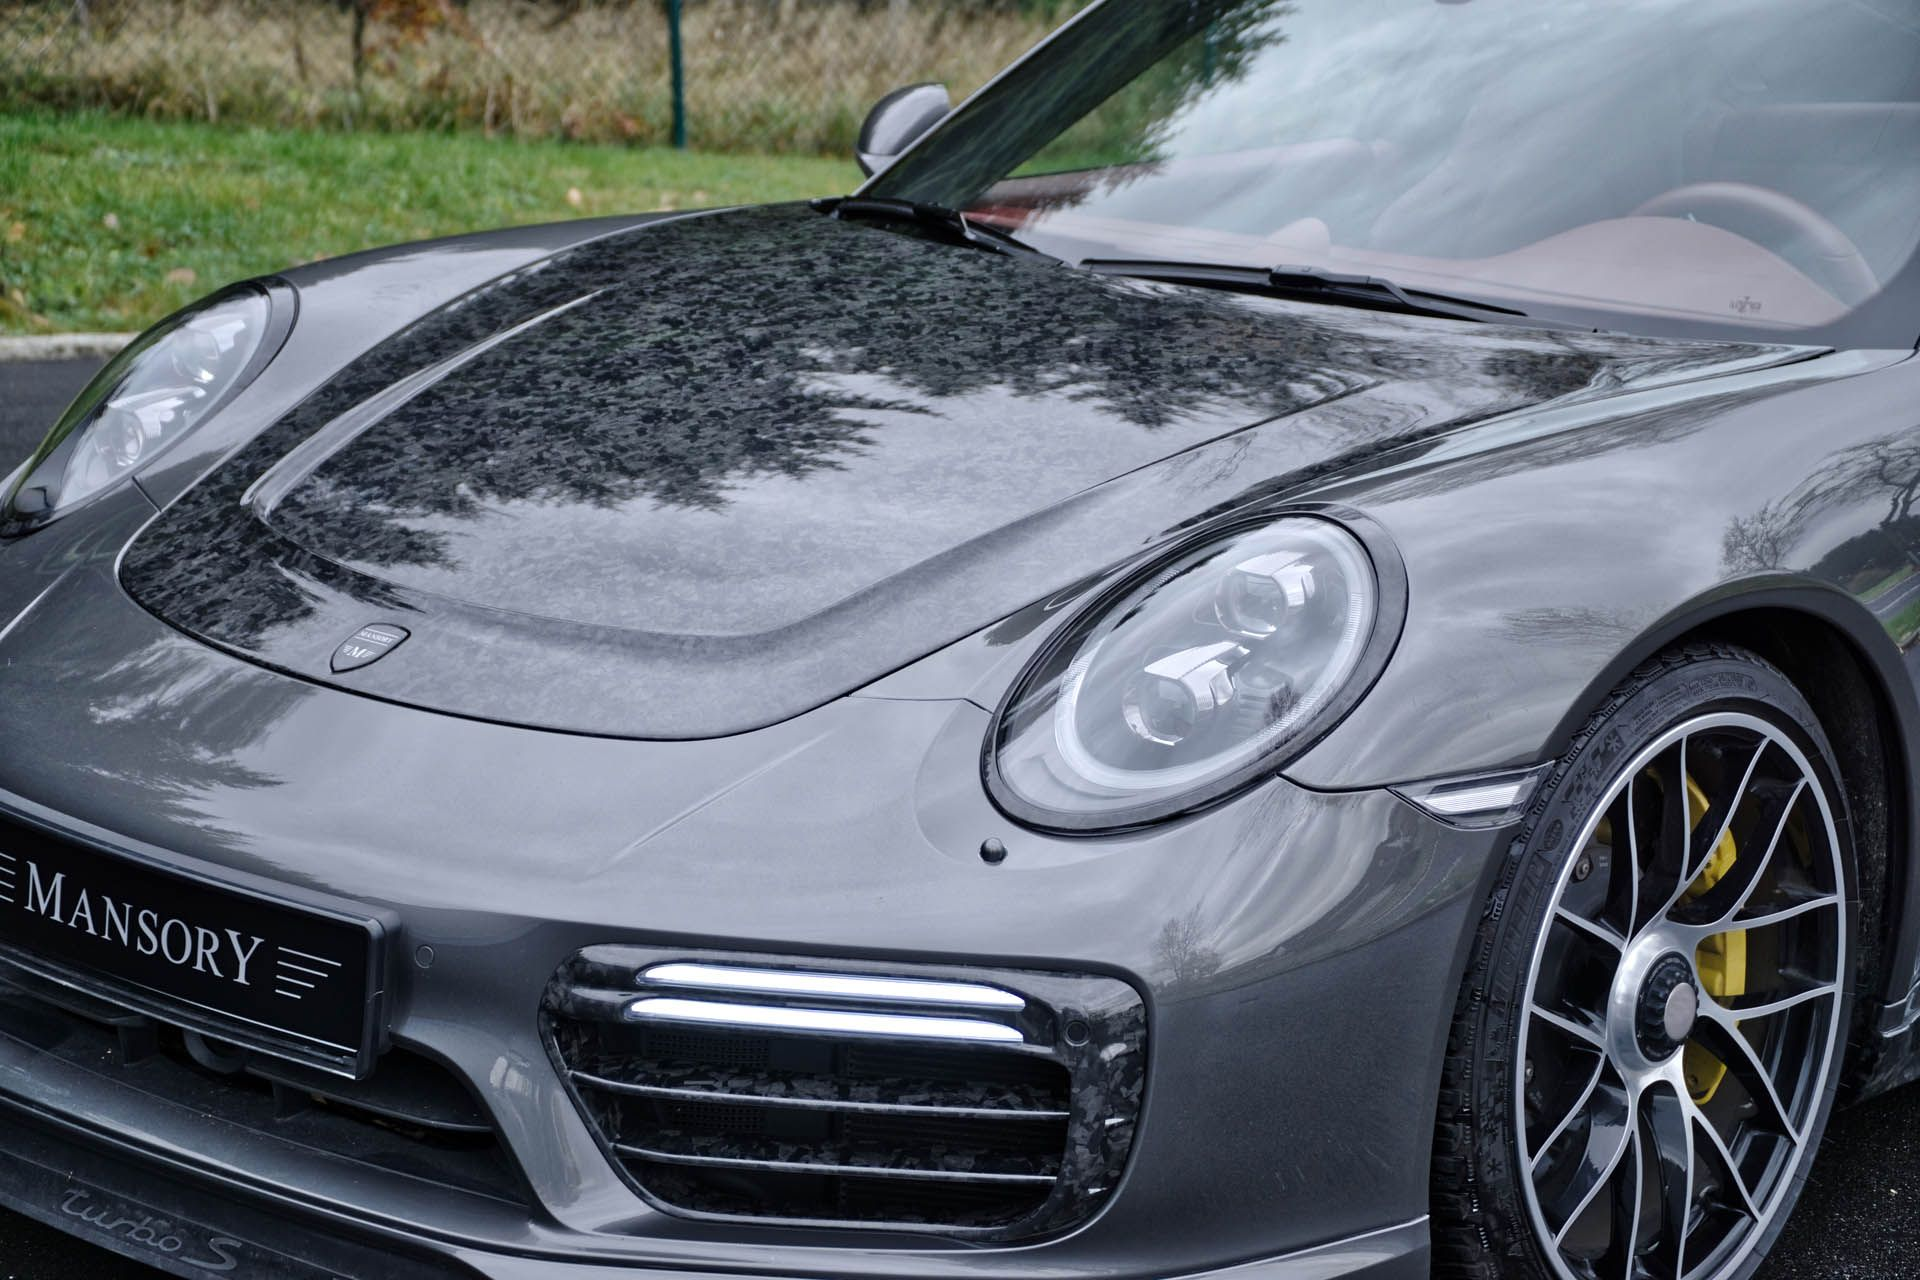 Porsche_911_Turb0_by_Mansory_0002